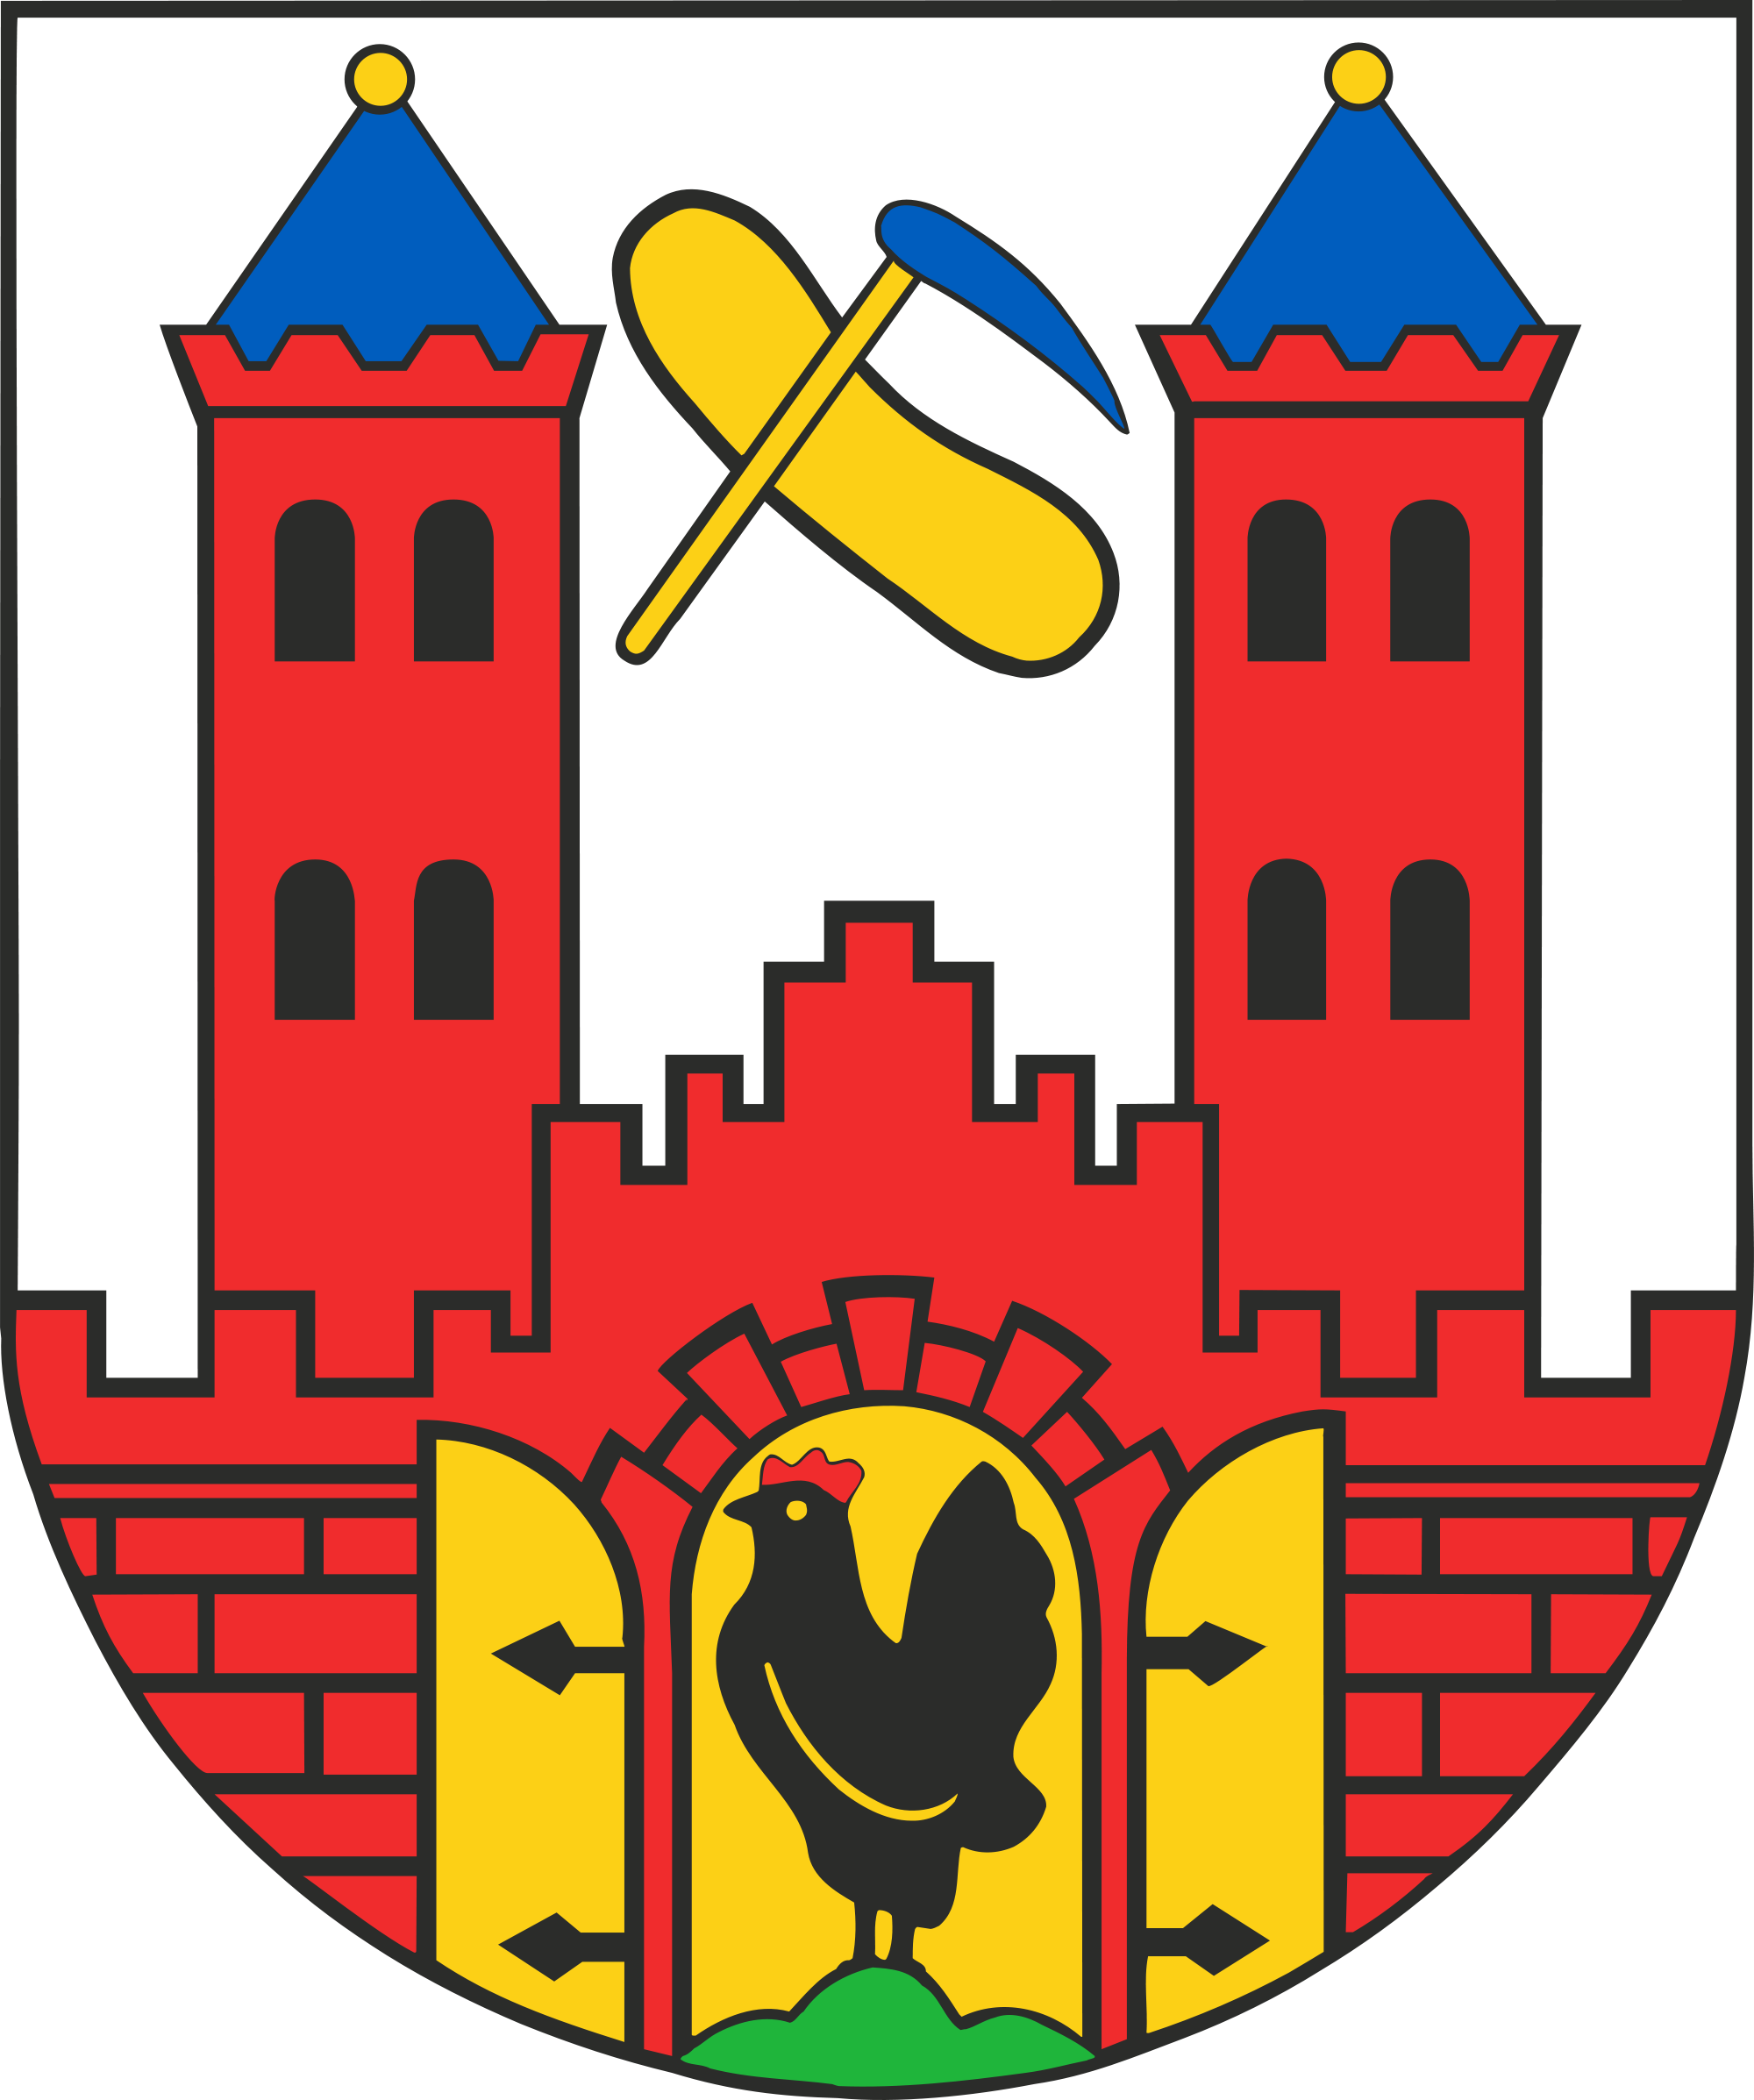 File:Wappen Suhl.svg.